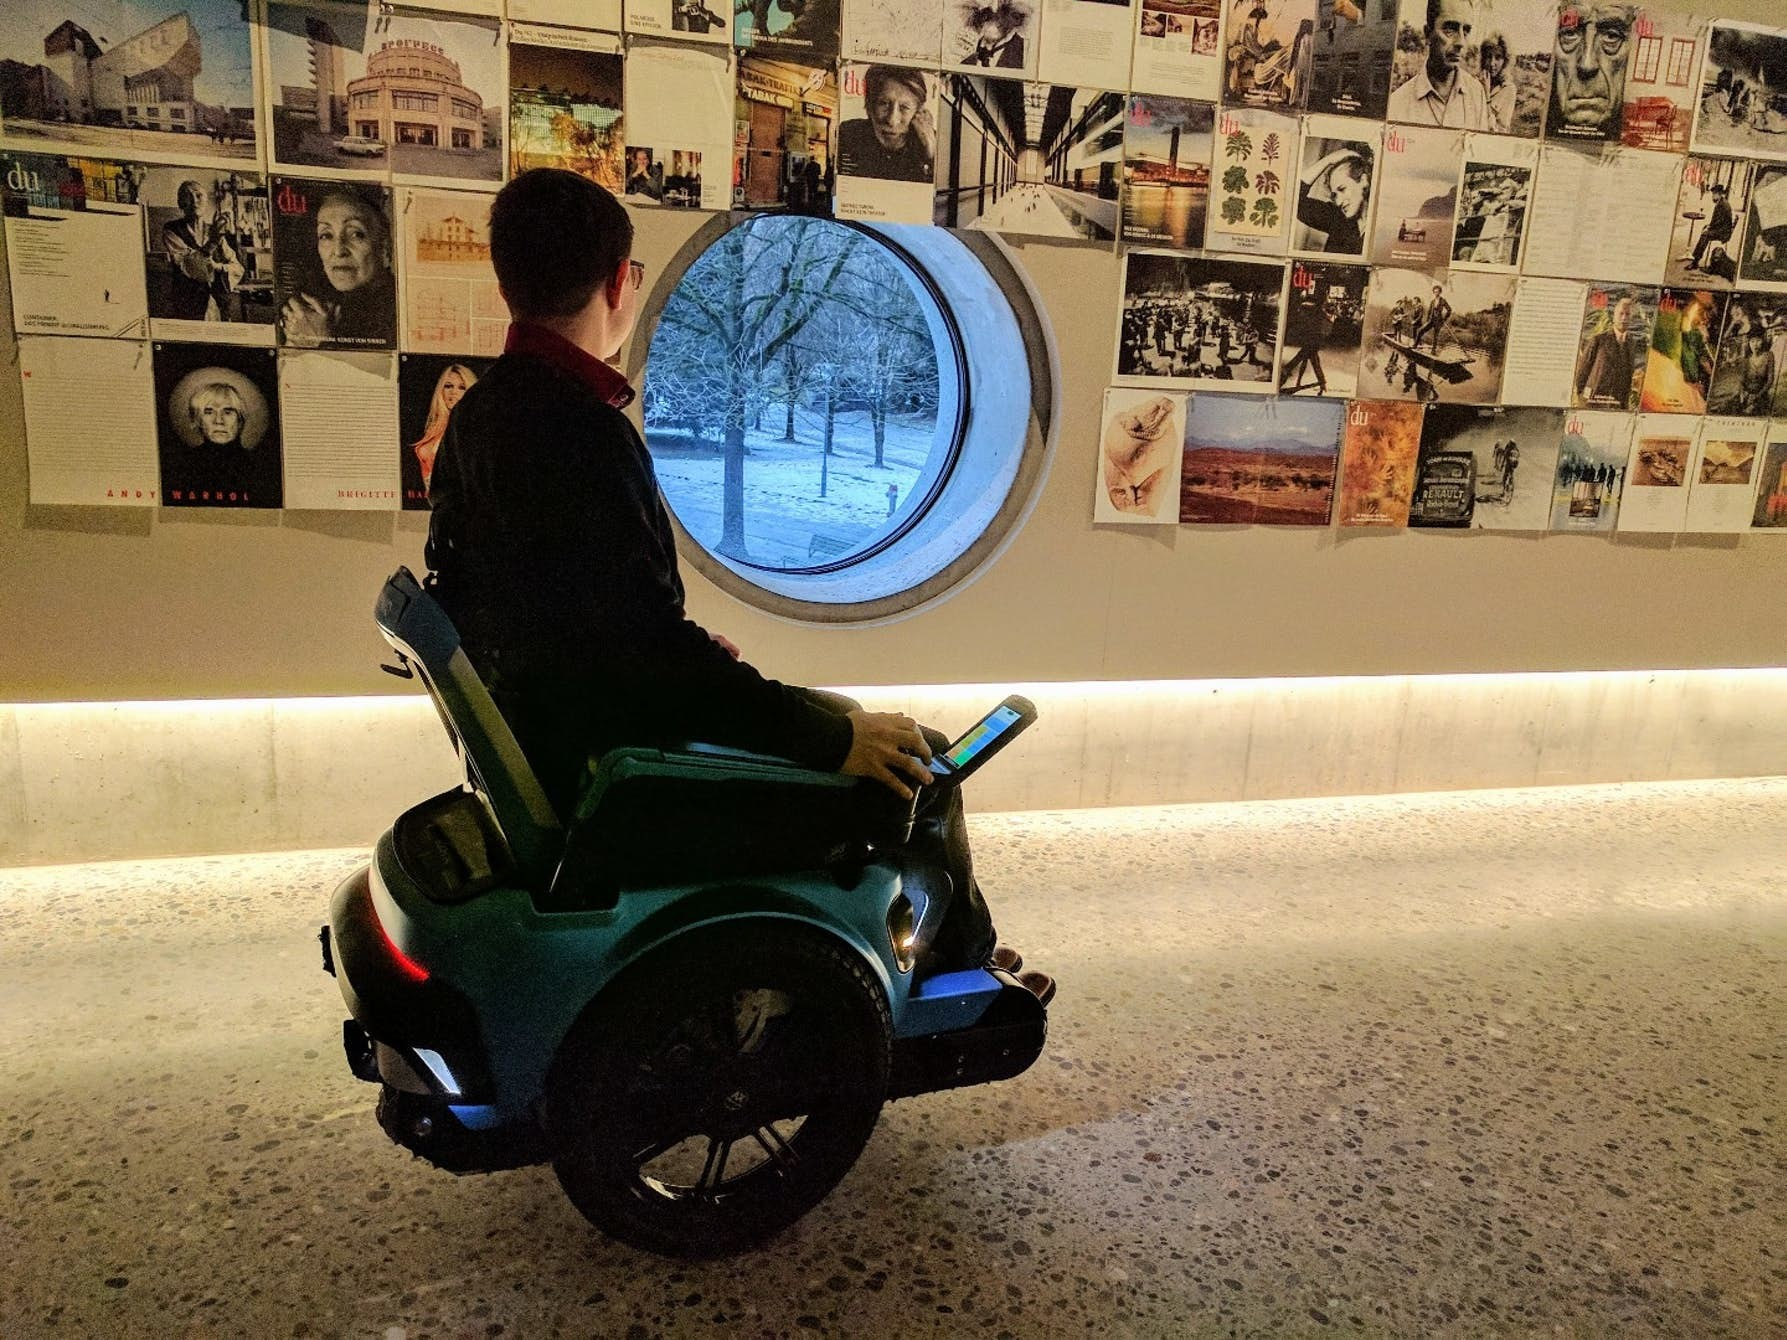 La silla de ruedas del siglo xxi se mueve como un segway for Silla que se mueve